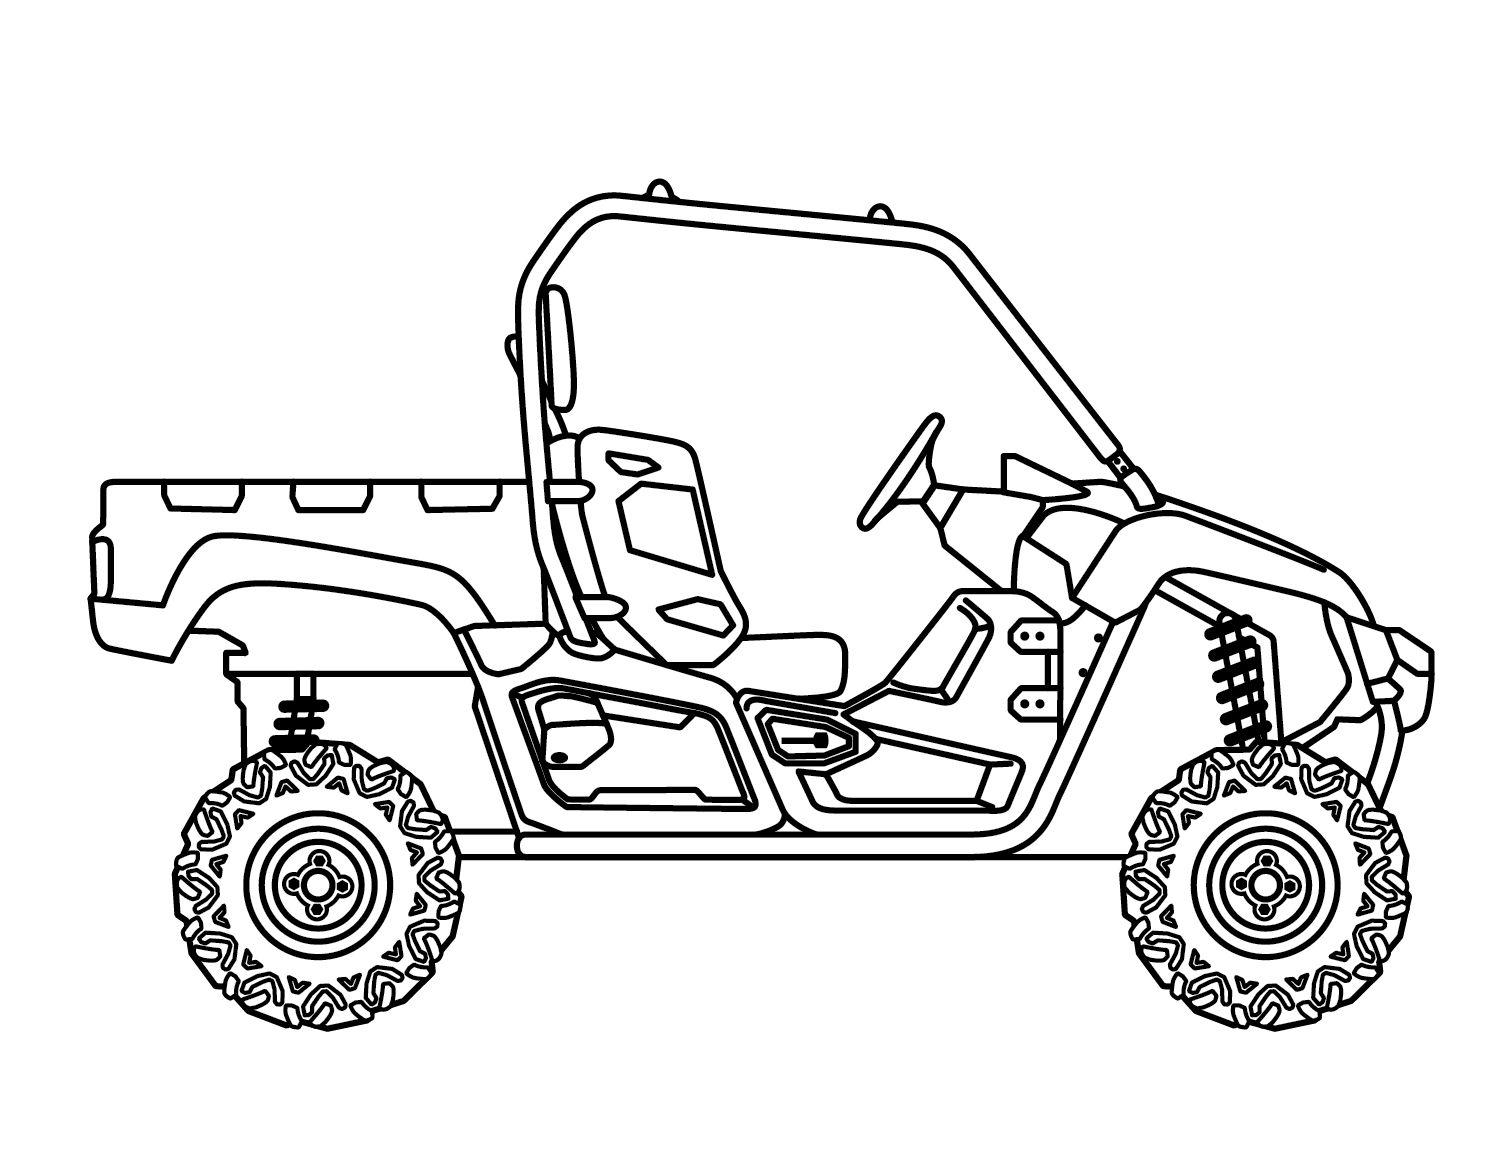 Yamaha G29 Golf Cart Wiring Diagram. Diagram. Auto Wiring